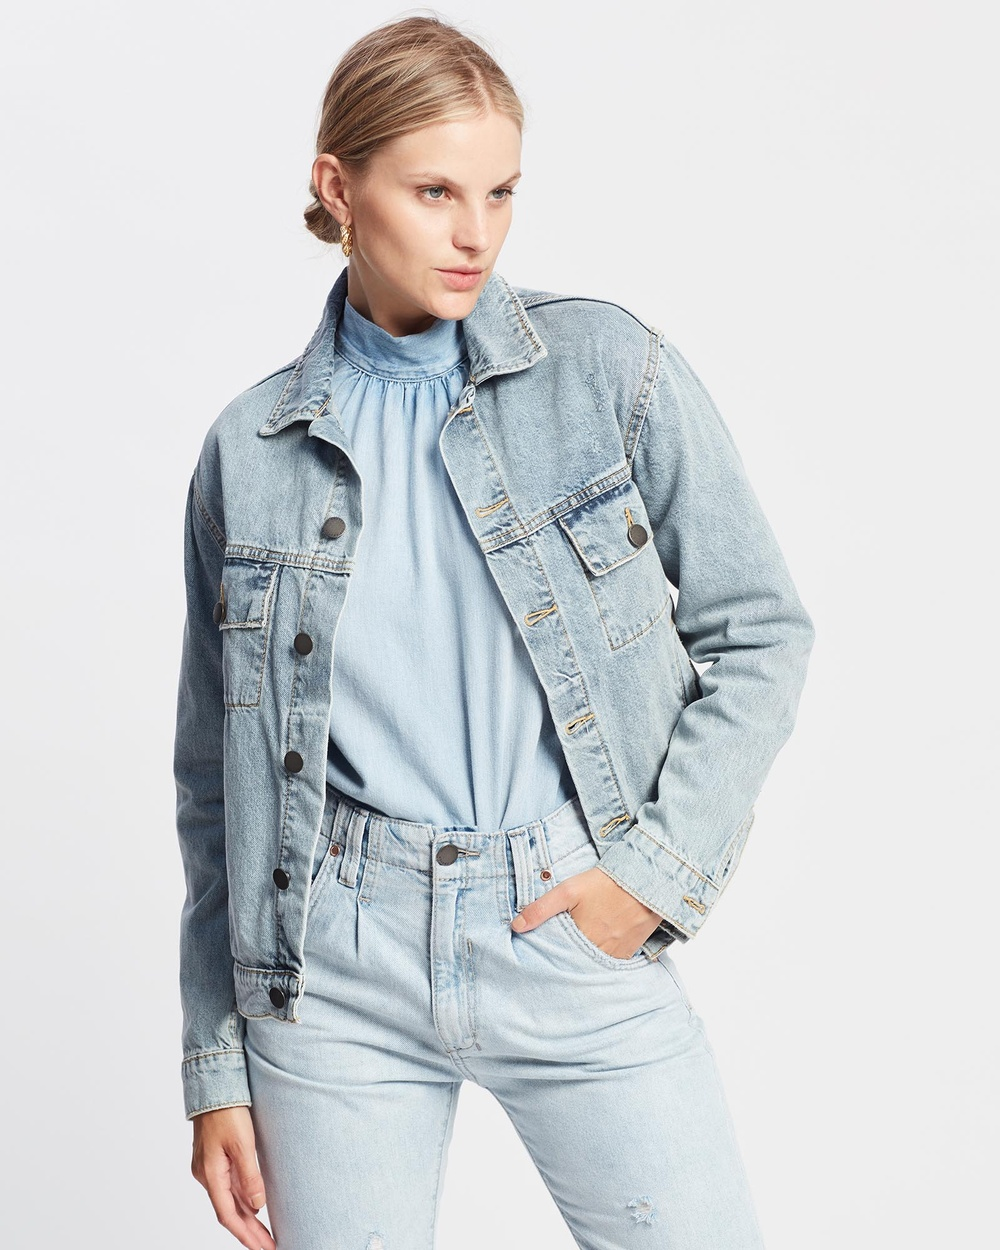 DRICOPER DENIM Dazzler Denim Jacket jacket Lighties Australia